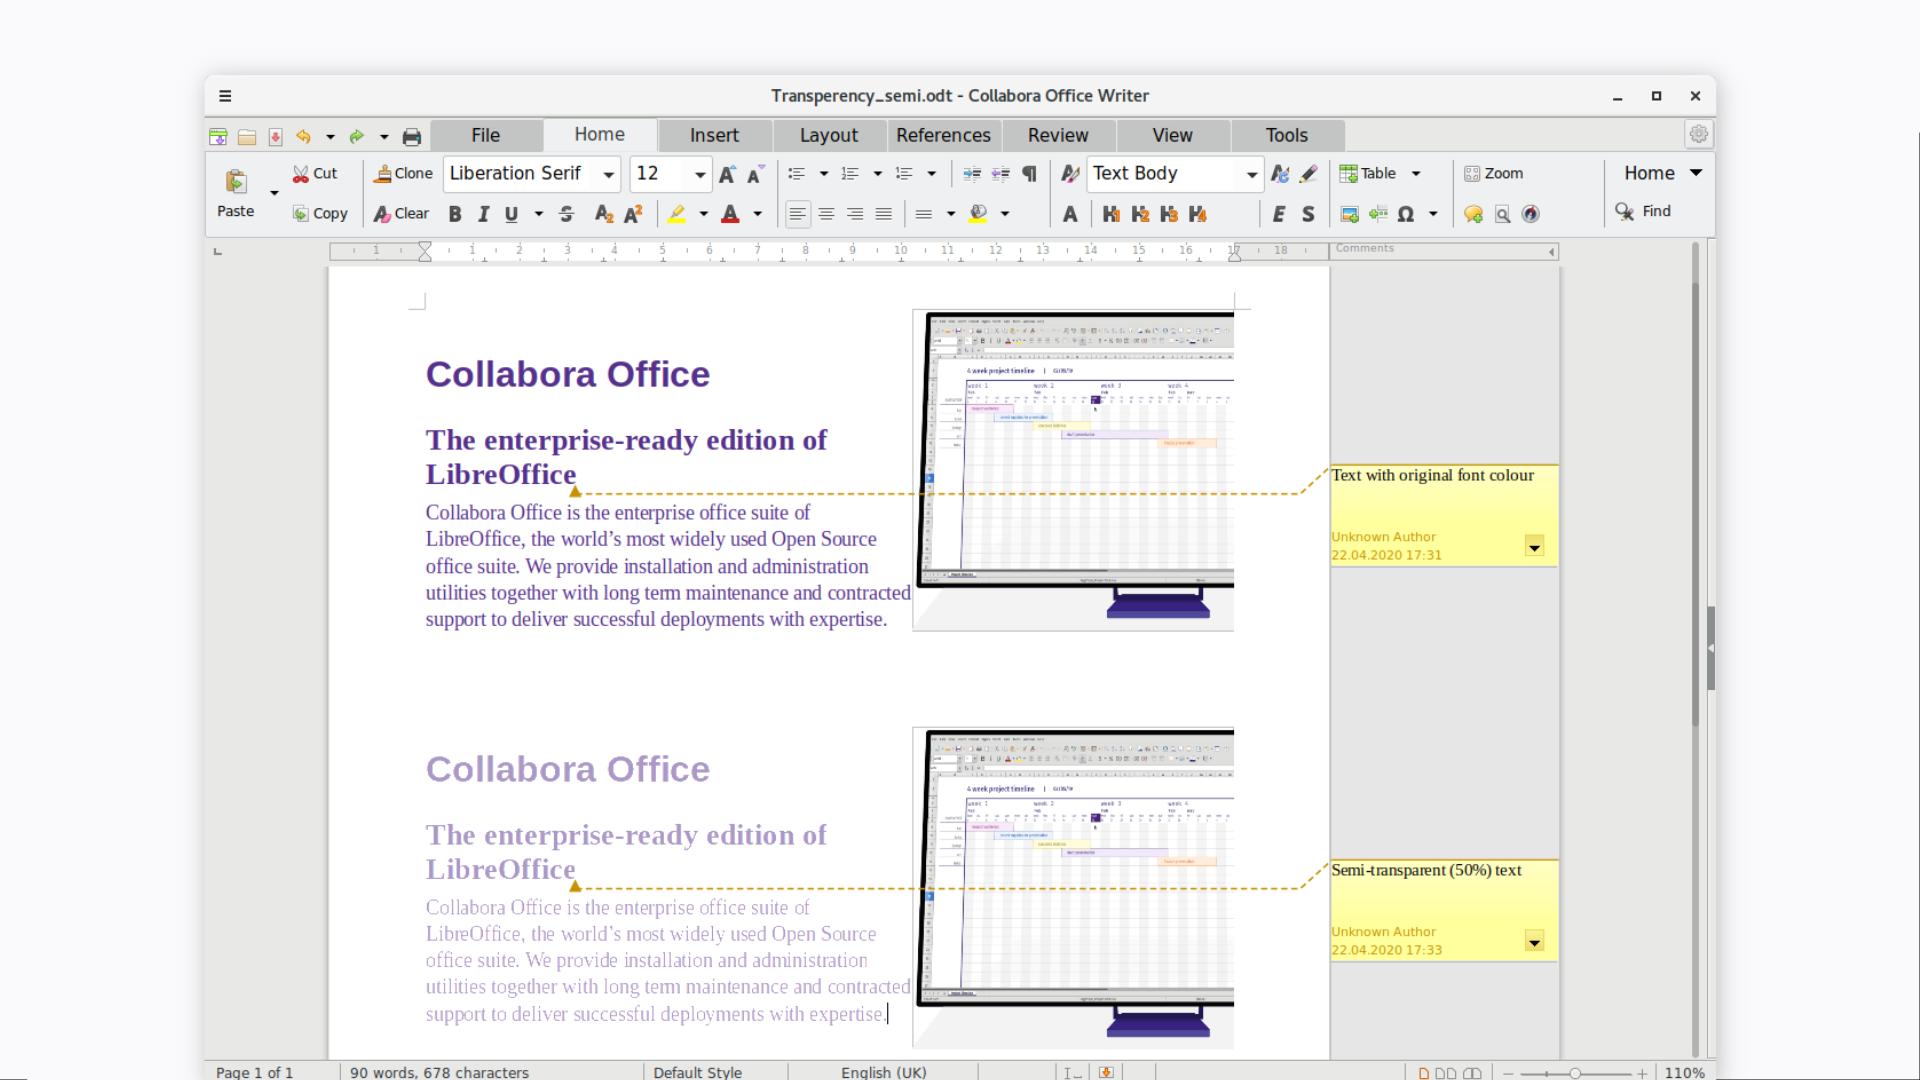 LGM2020 slide: LibreOffice